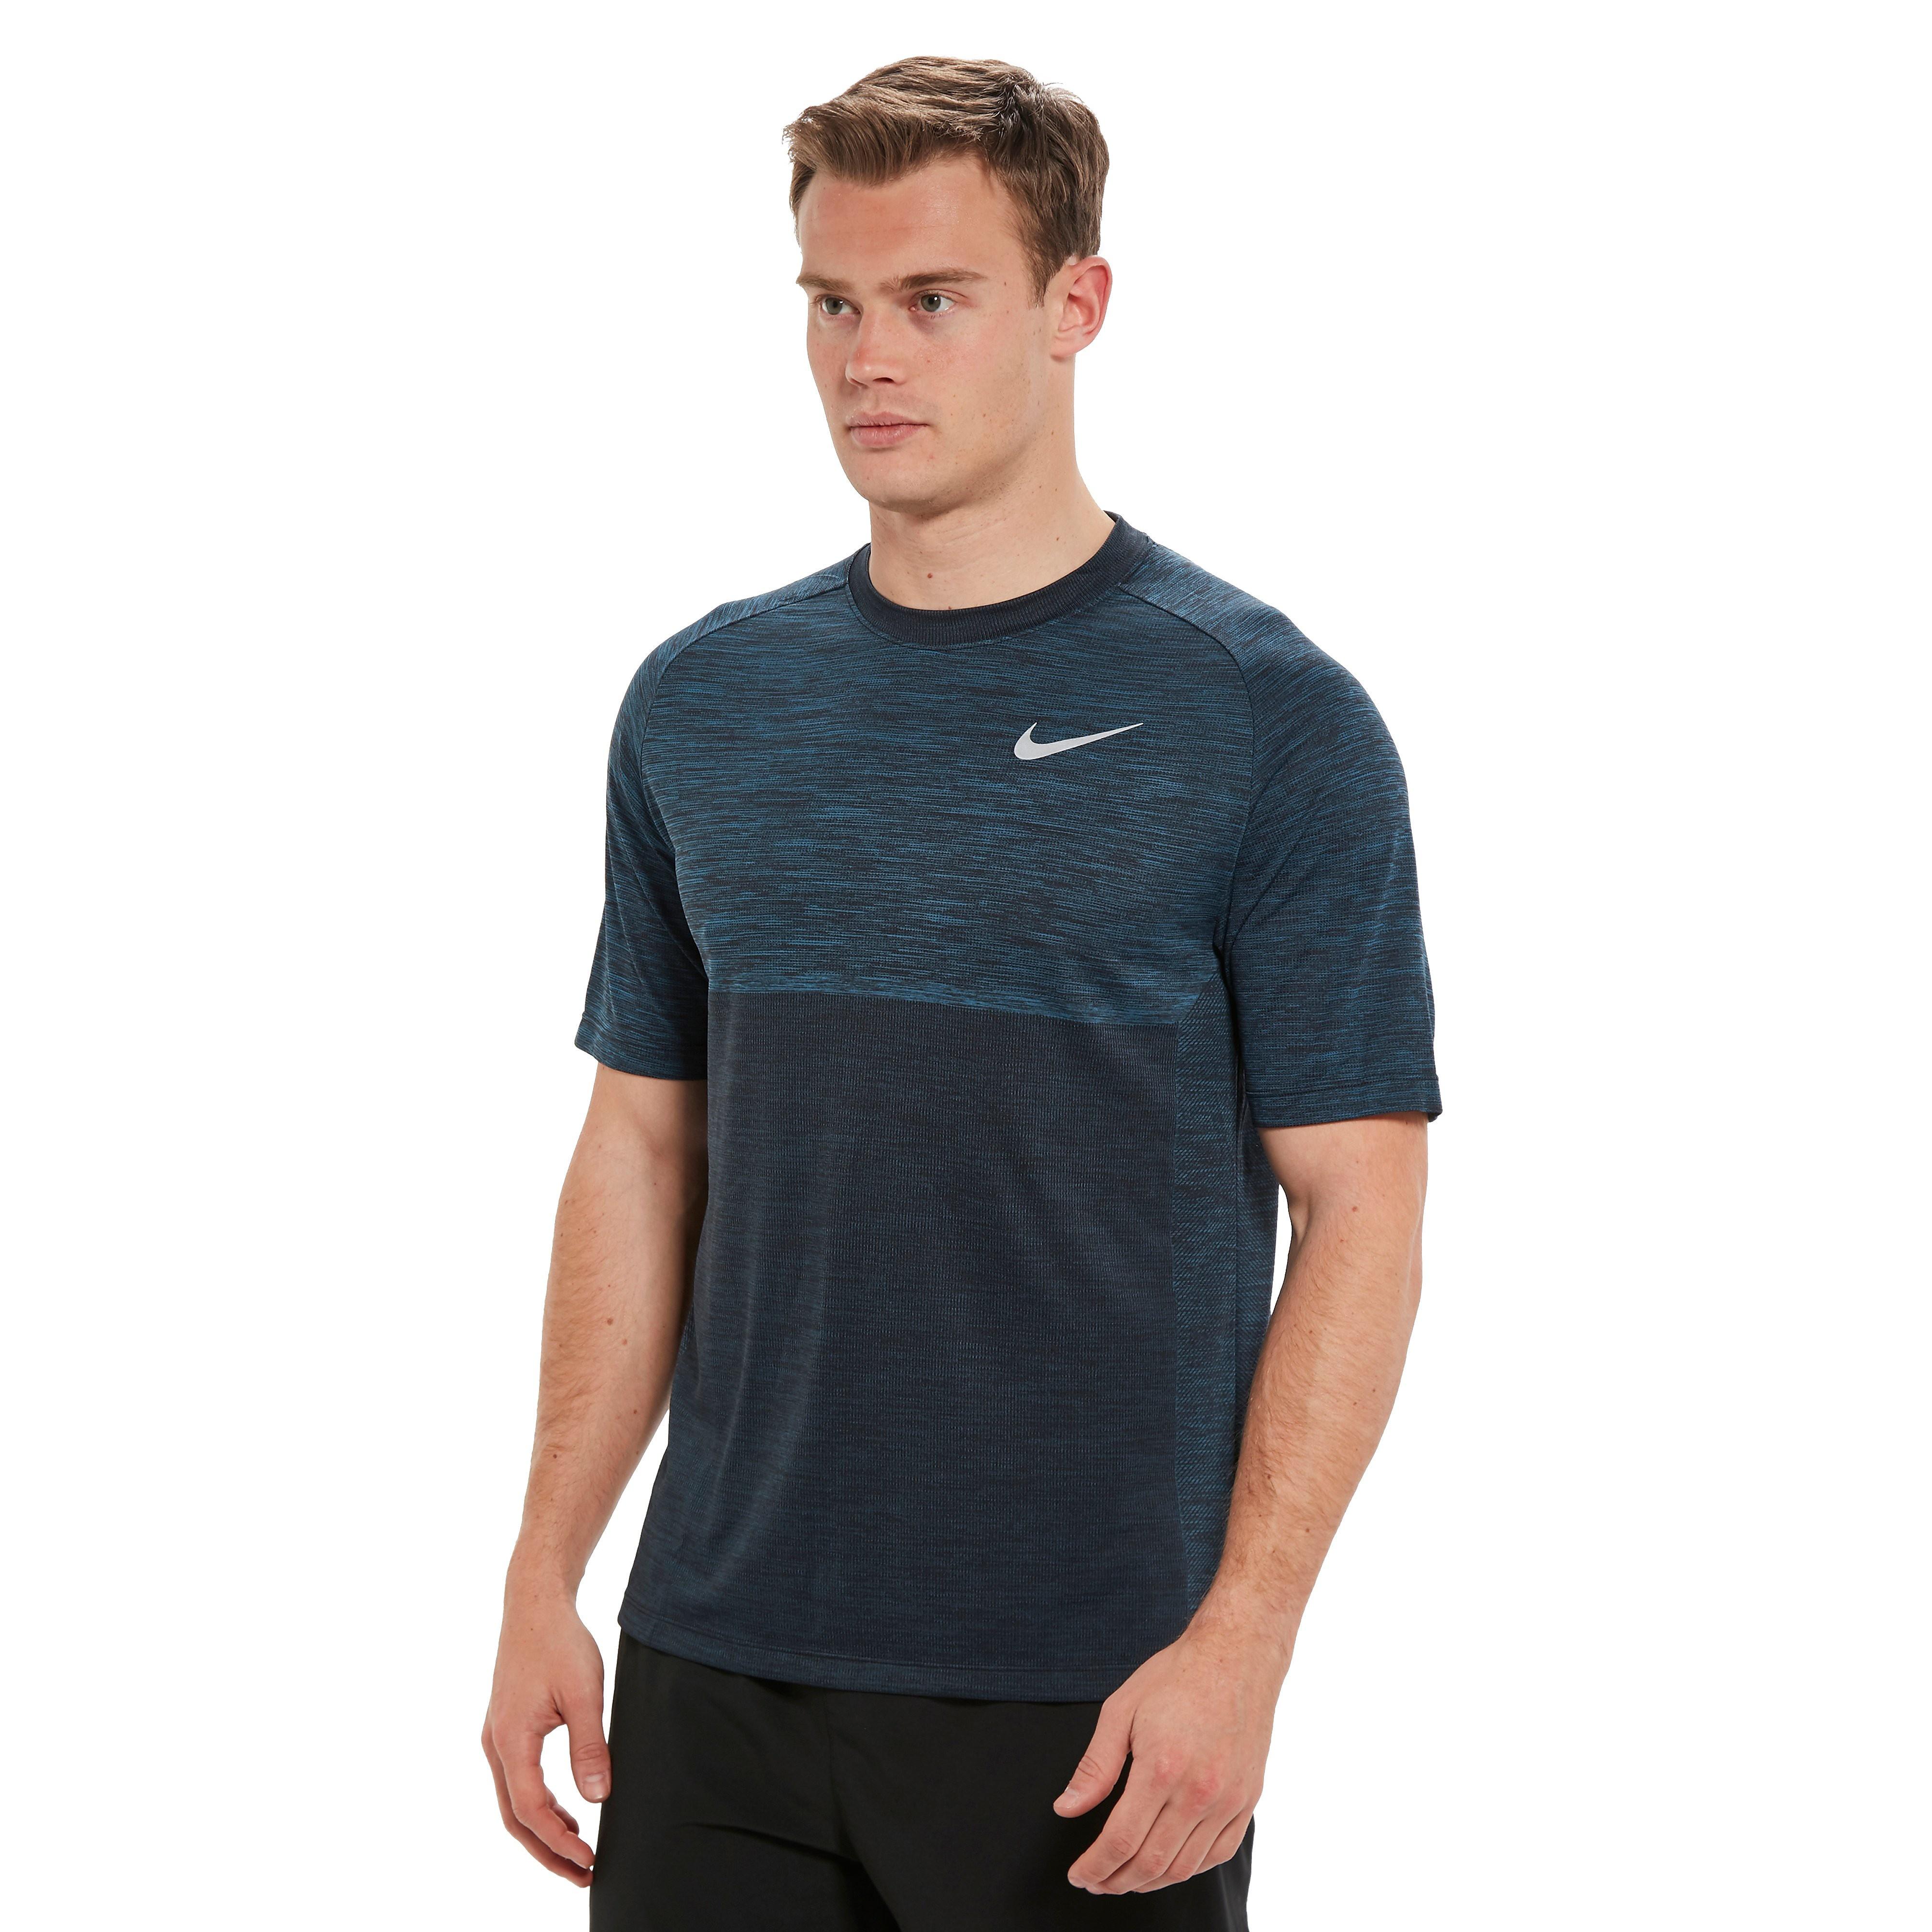 Nike Medalist Short Sleeve Men's Running Top